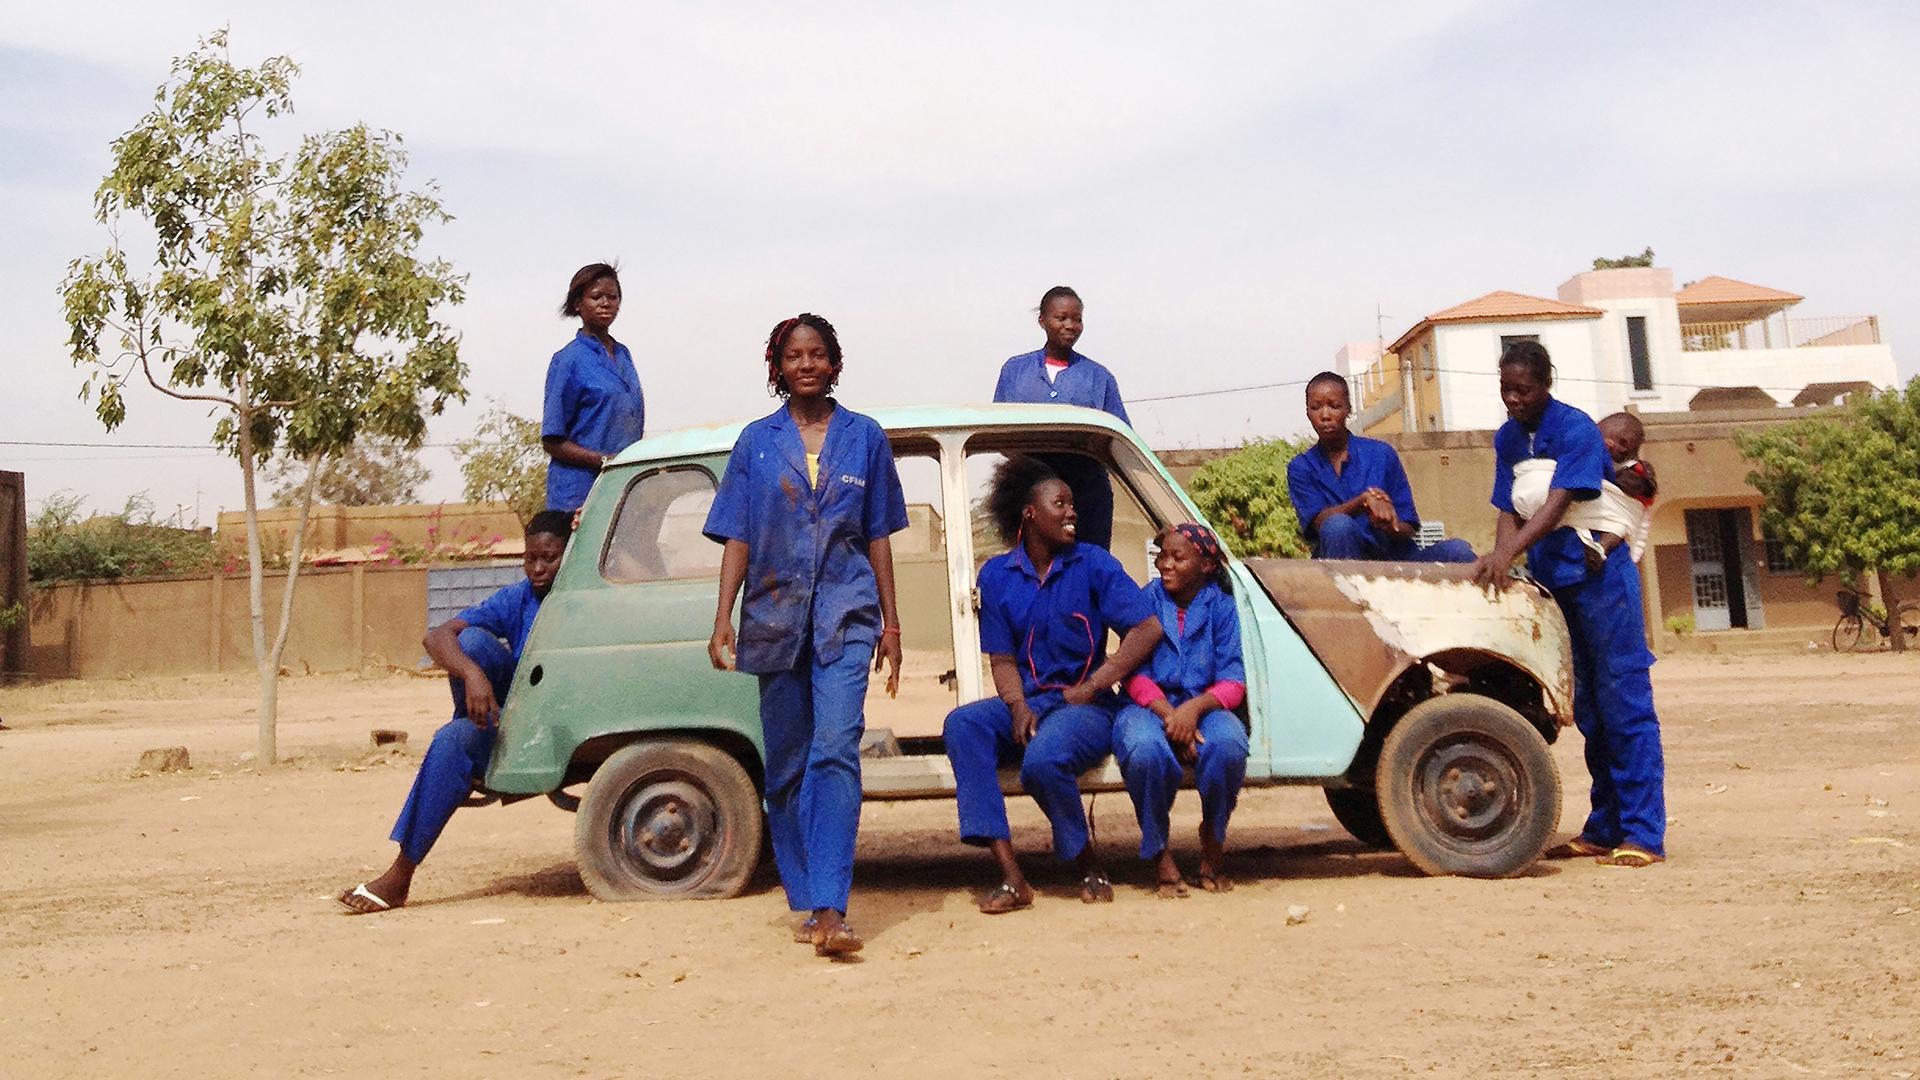 horor stockholm prostituerade i afrika